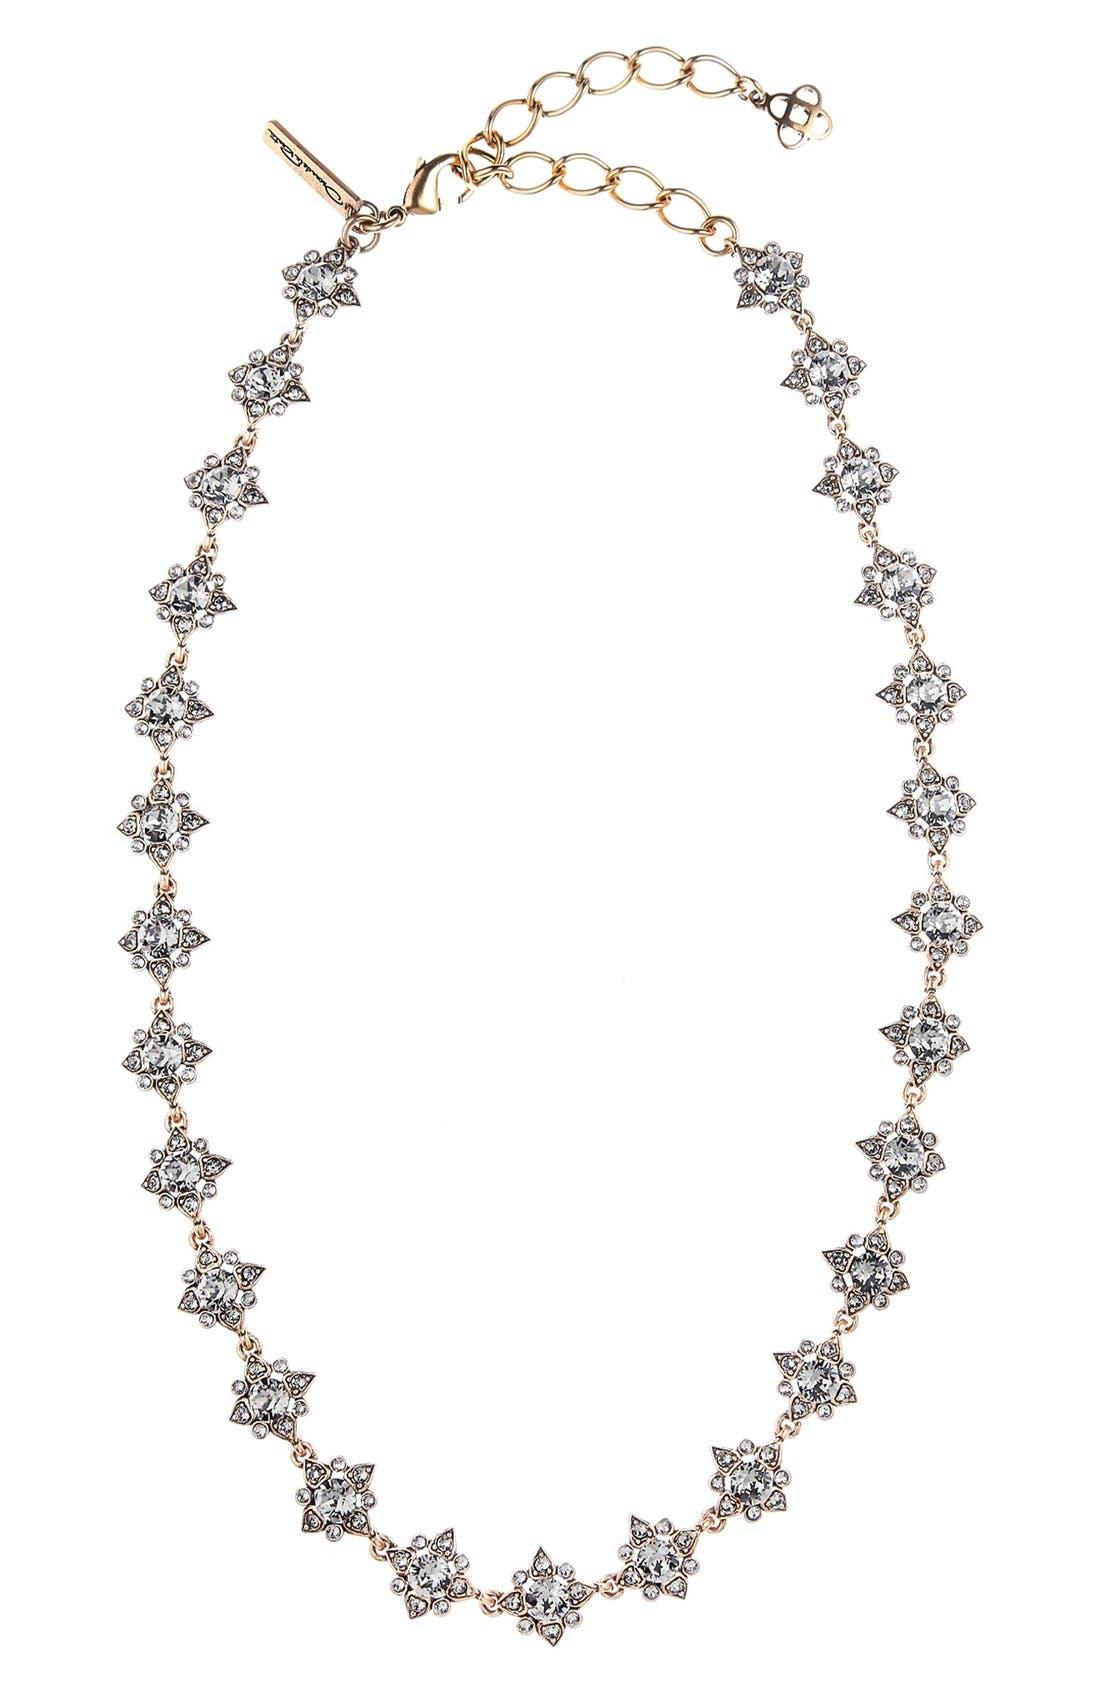 'Delicate Star' Swarovski Crystal Collar Necklace,                             Main thumbnail 1, color,                             001